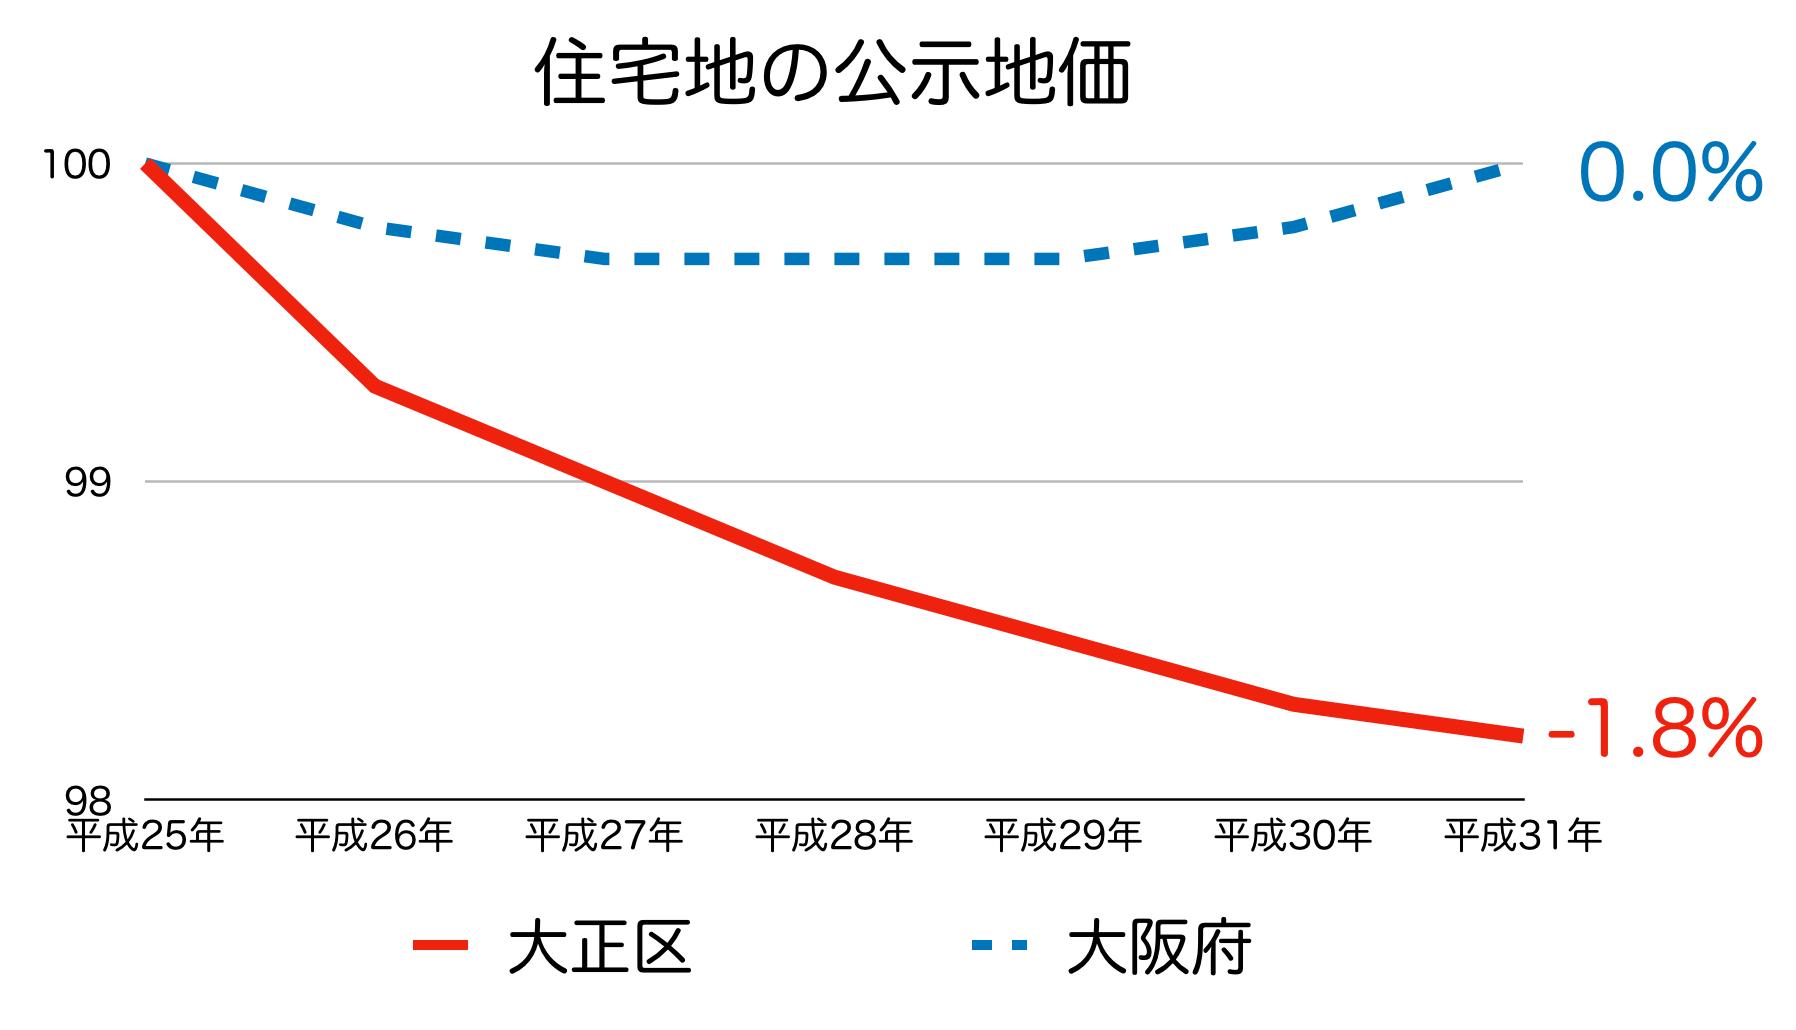 大阪市大正区の公示地価 H25-H31